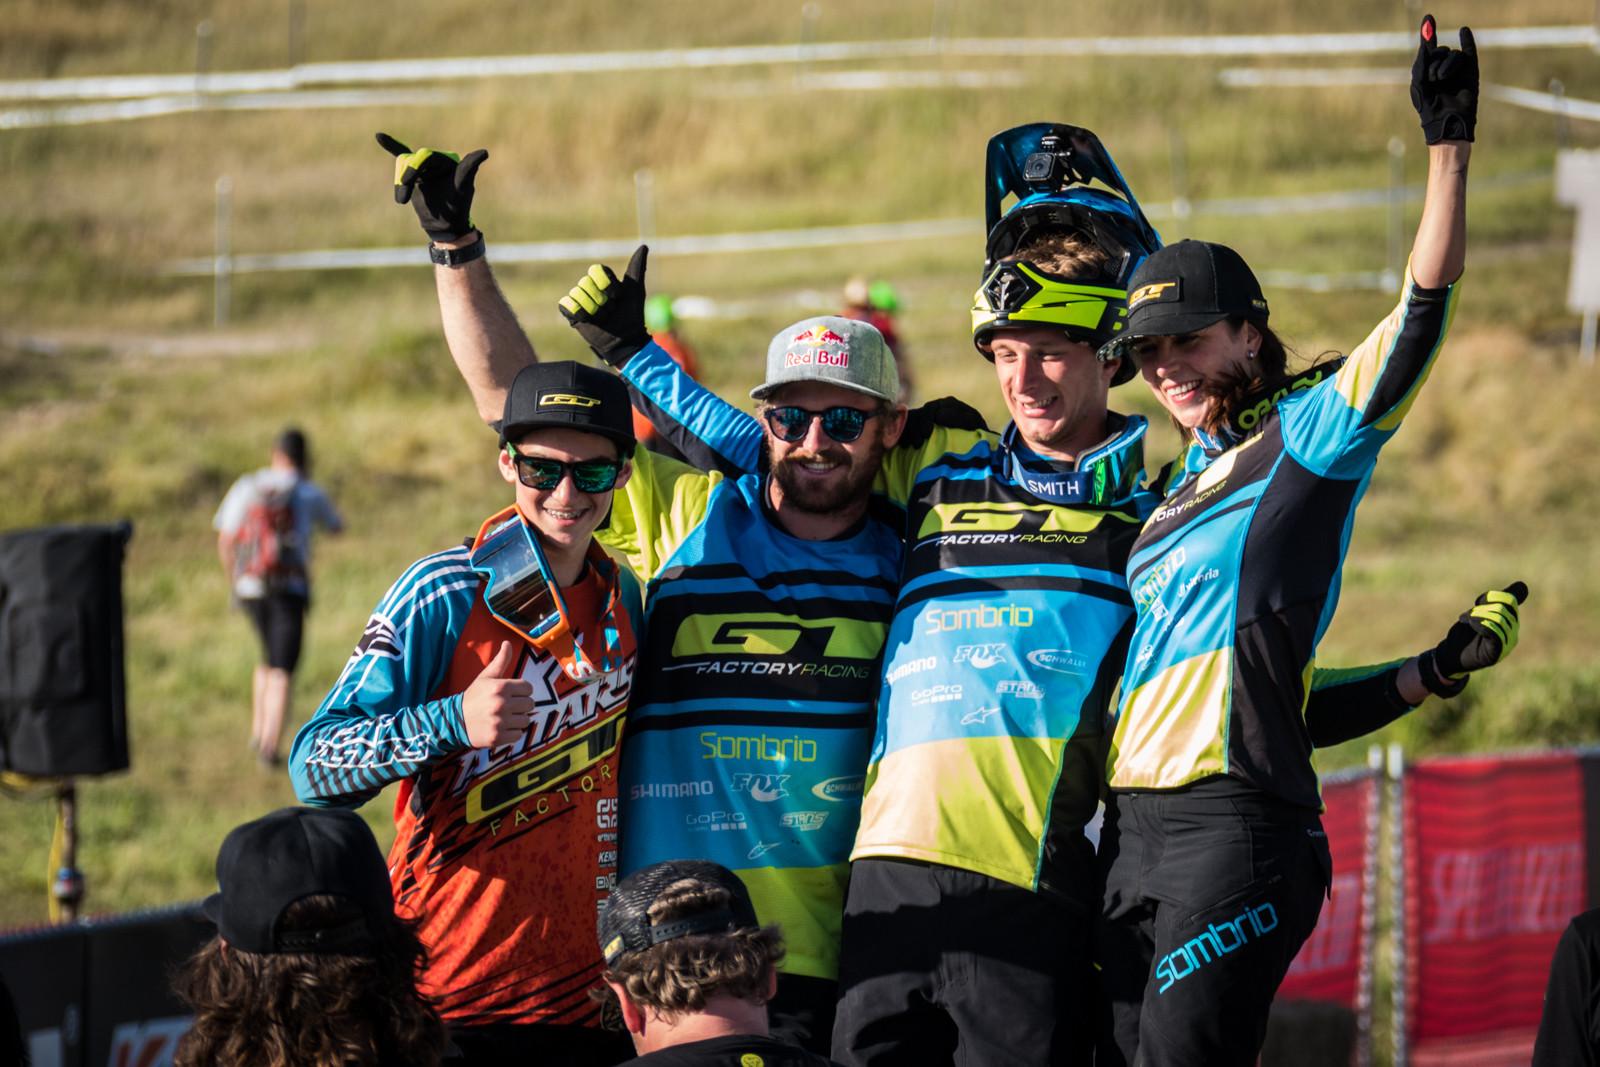 GT Had a Good Day - WINNING BIKE - Martin Maes' GT Distortion - Mountain Biking Pictures - Vital MTB